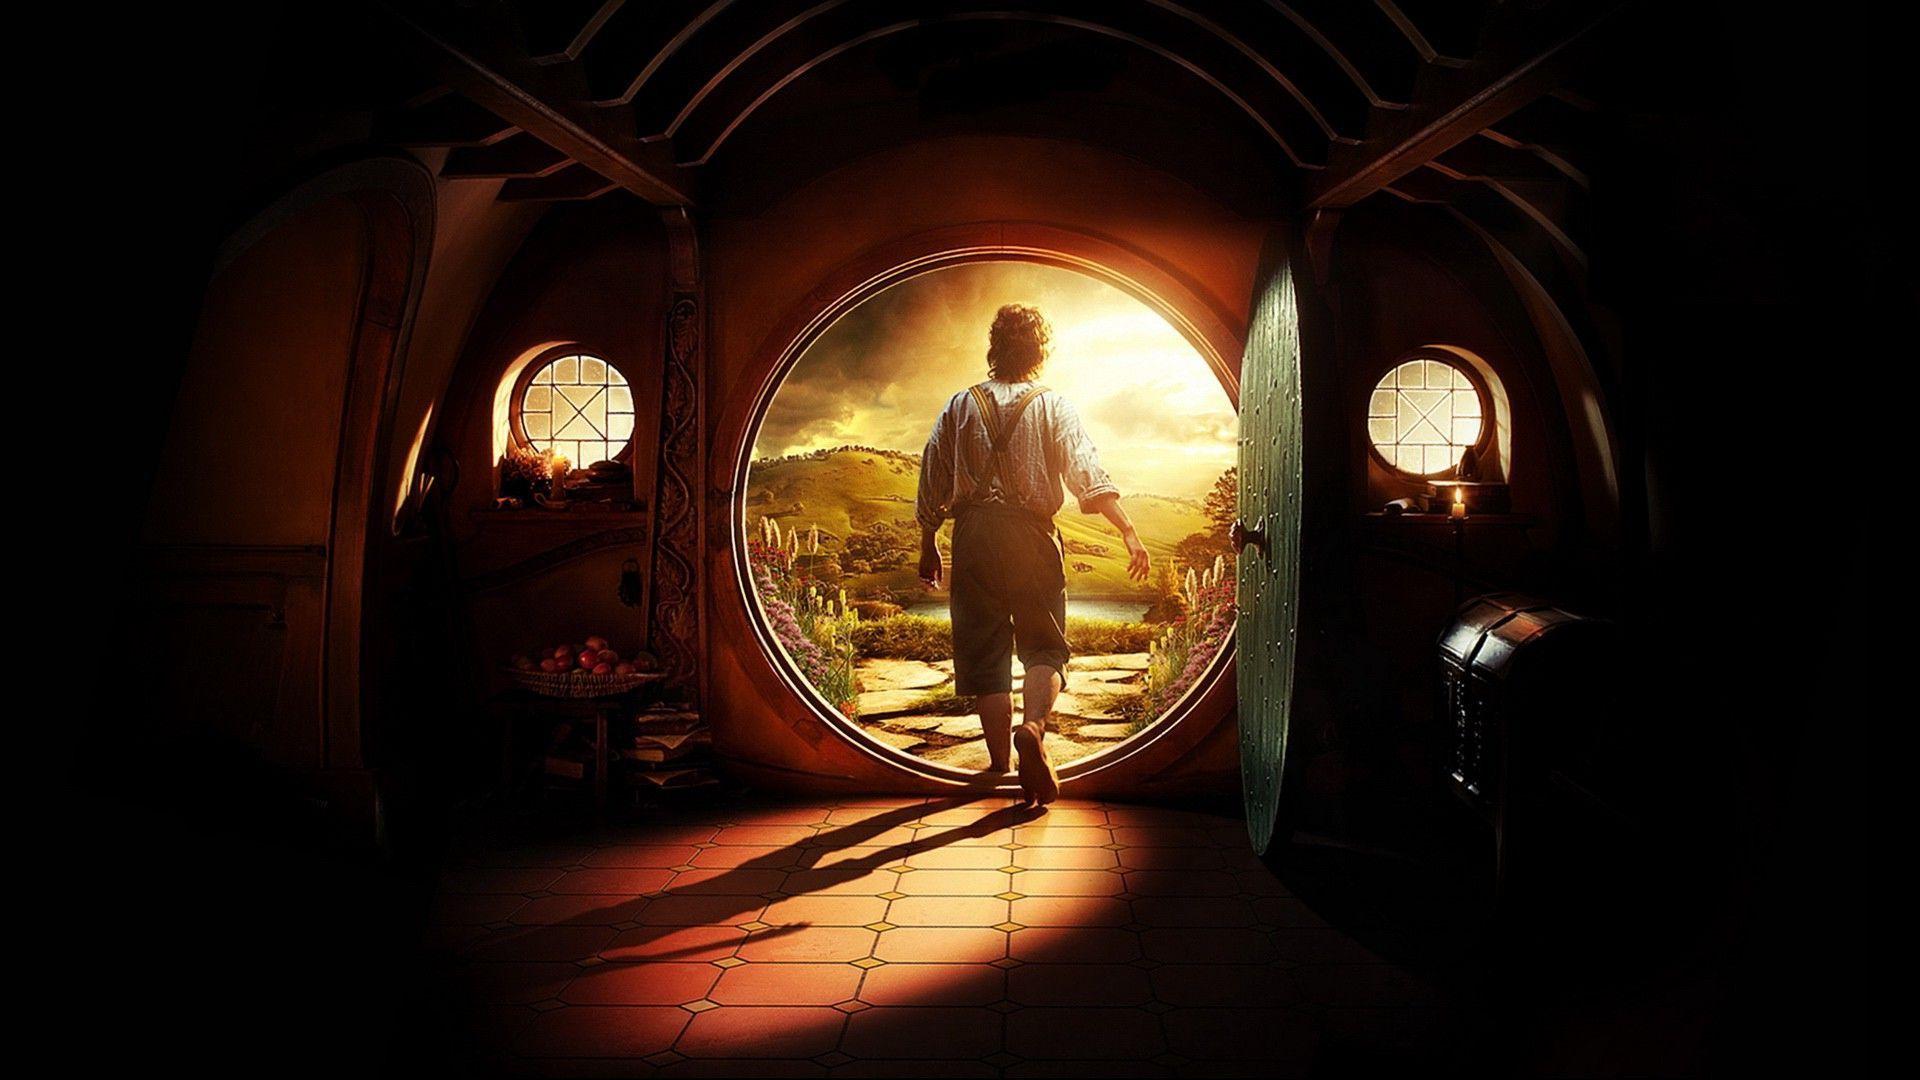 The Hobbit Image download on the digitalimagemakerworldcom 1920x1080